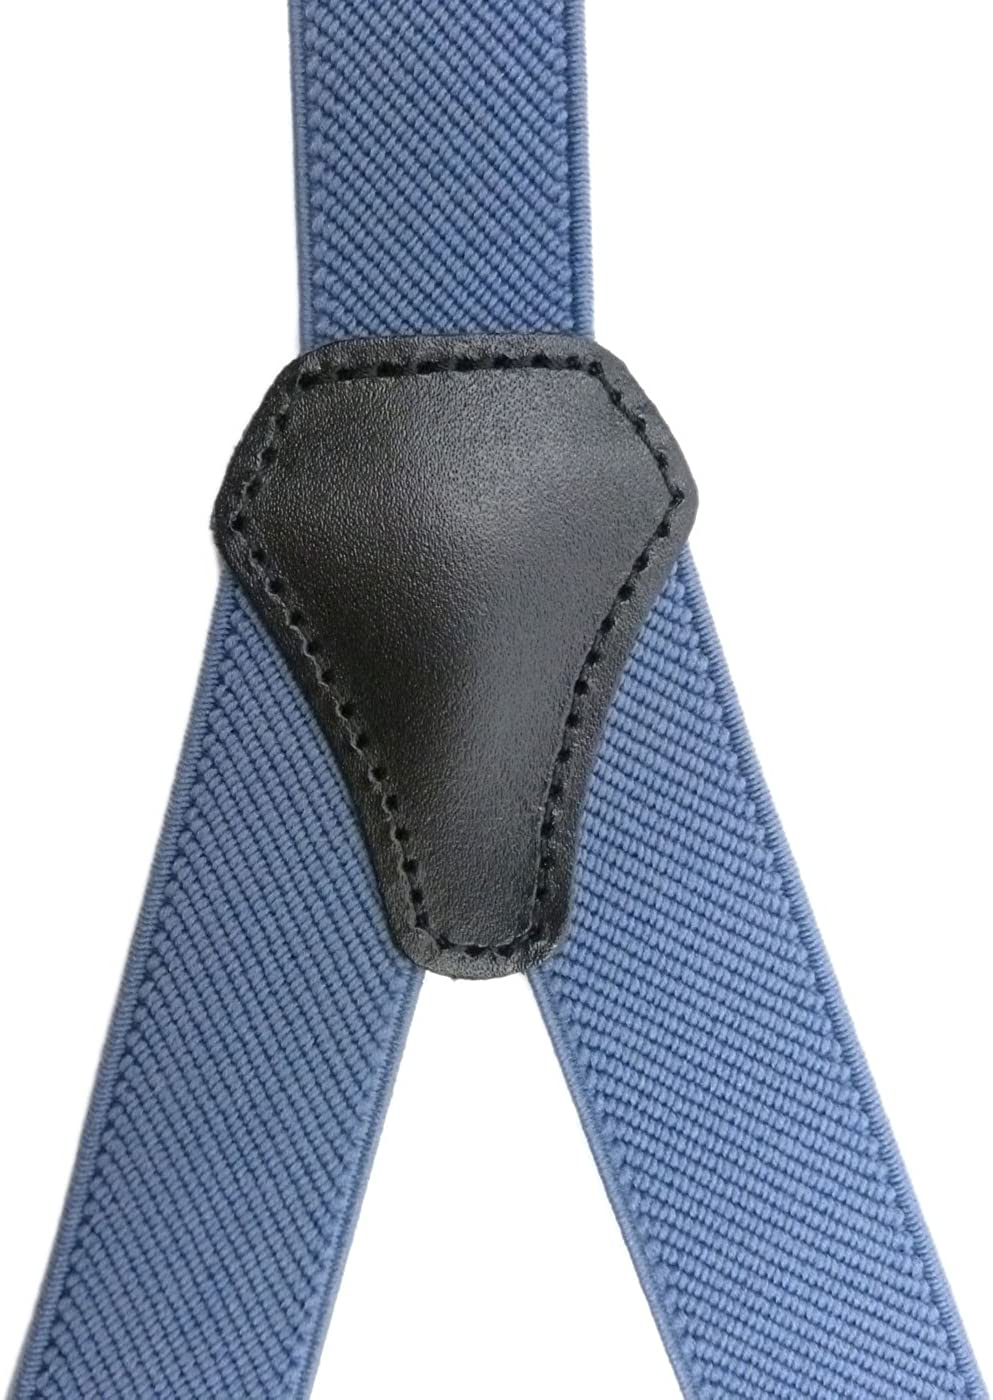 2.5cm Unisex Skinny Style fully adjustable Clip on Braces//Suspenders